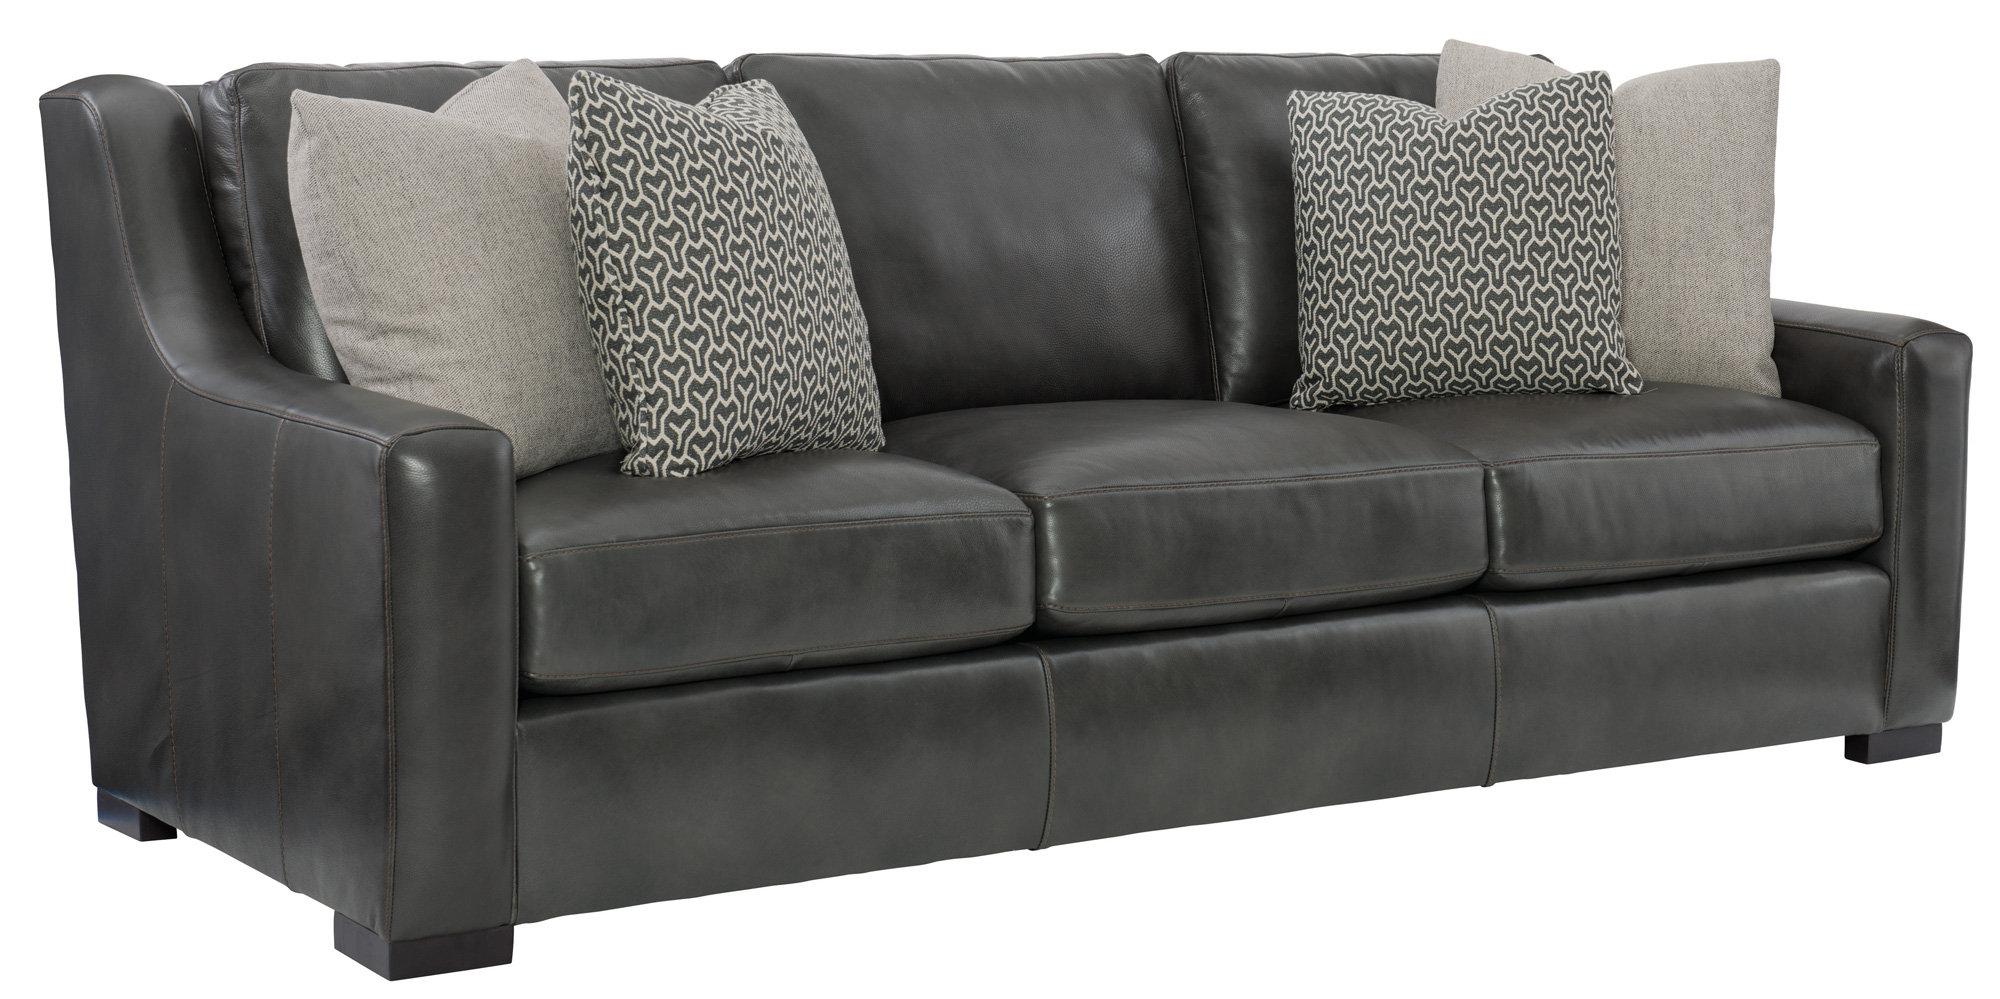 Bernhardt Leather Sofa Reviews Image Result For Bernhardt ...